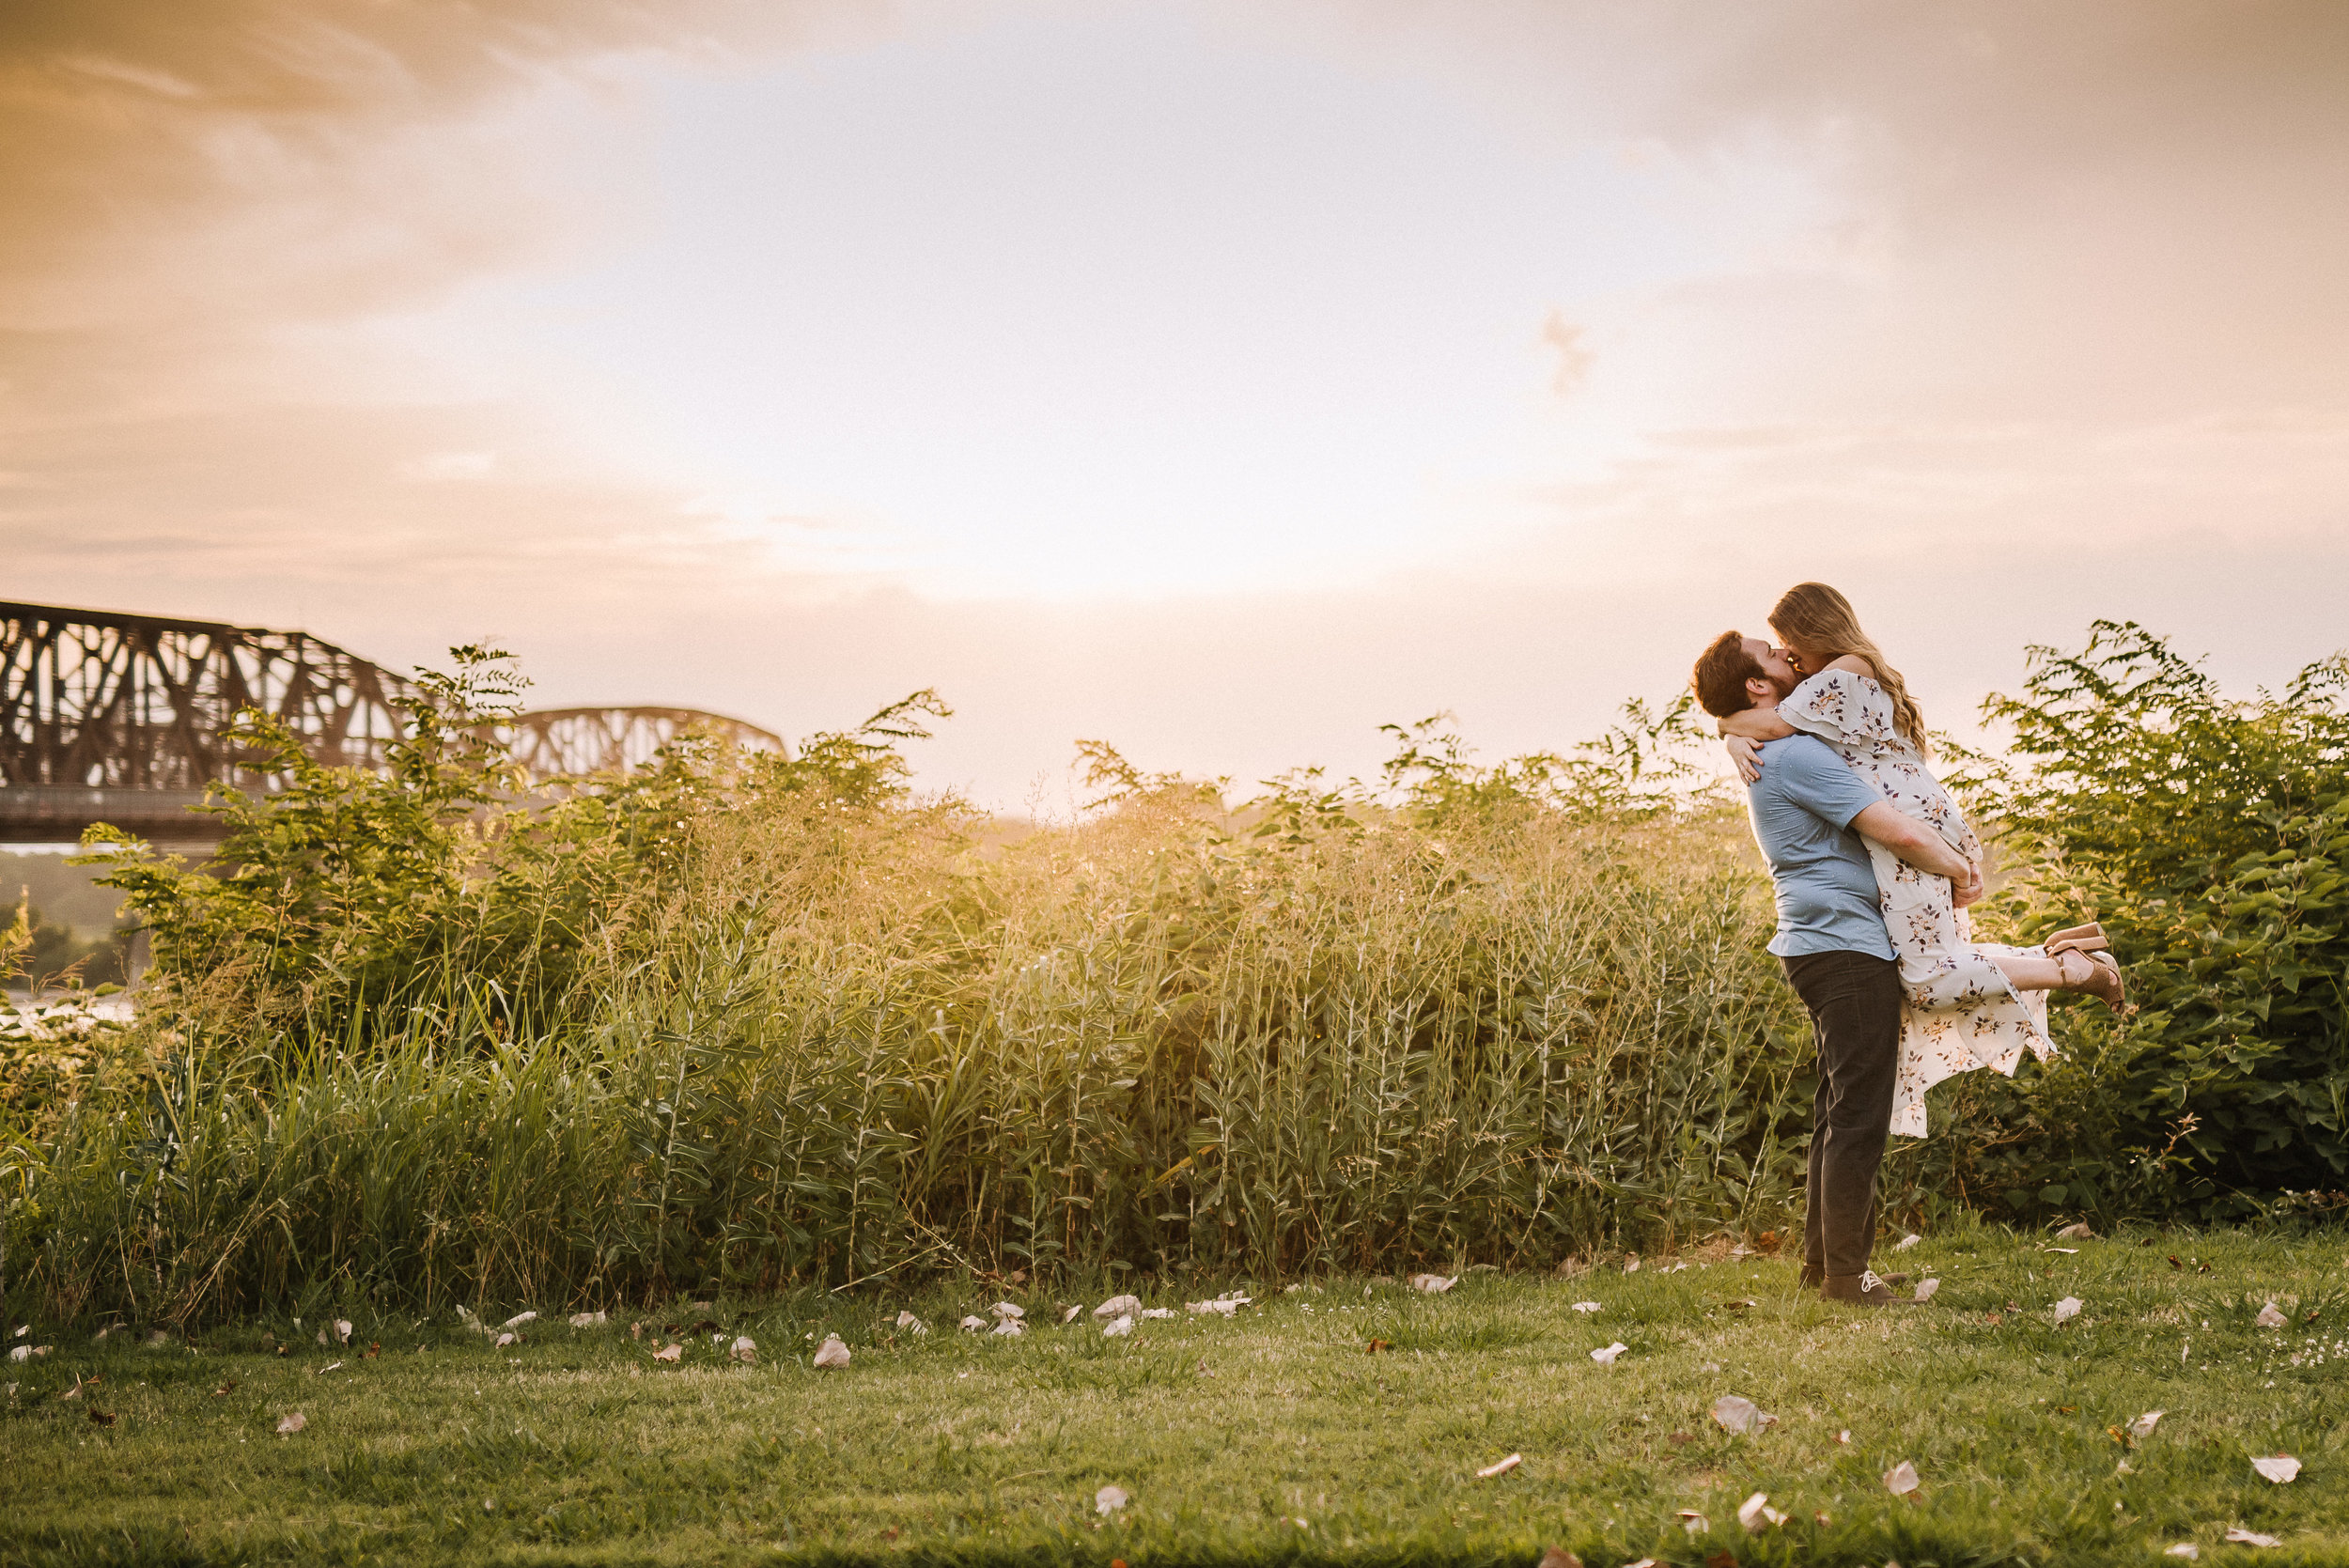 Maddie & Ryan_Shelby Farms_Martyrs Park_Ashley Benham Photography-108.jpg